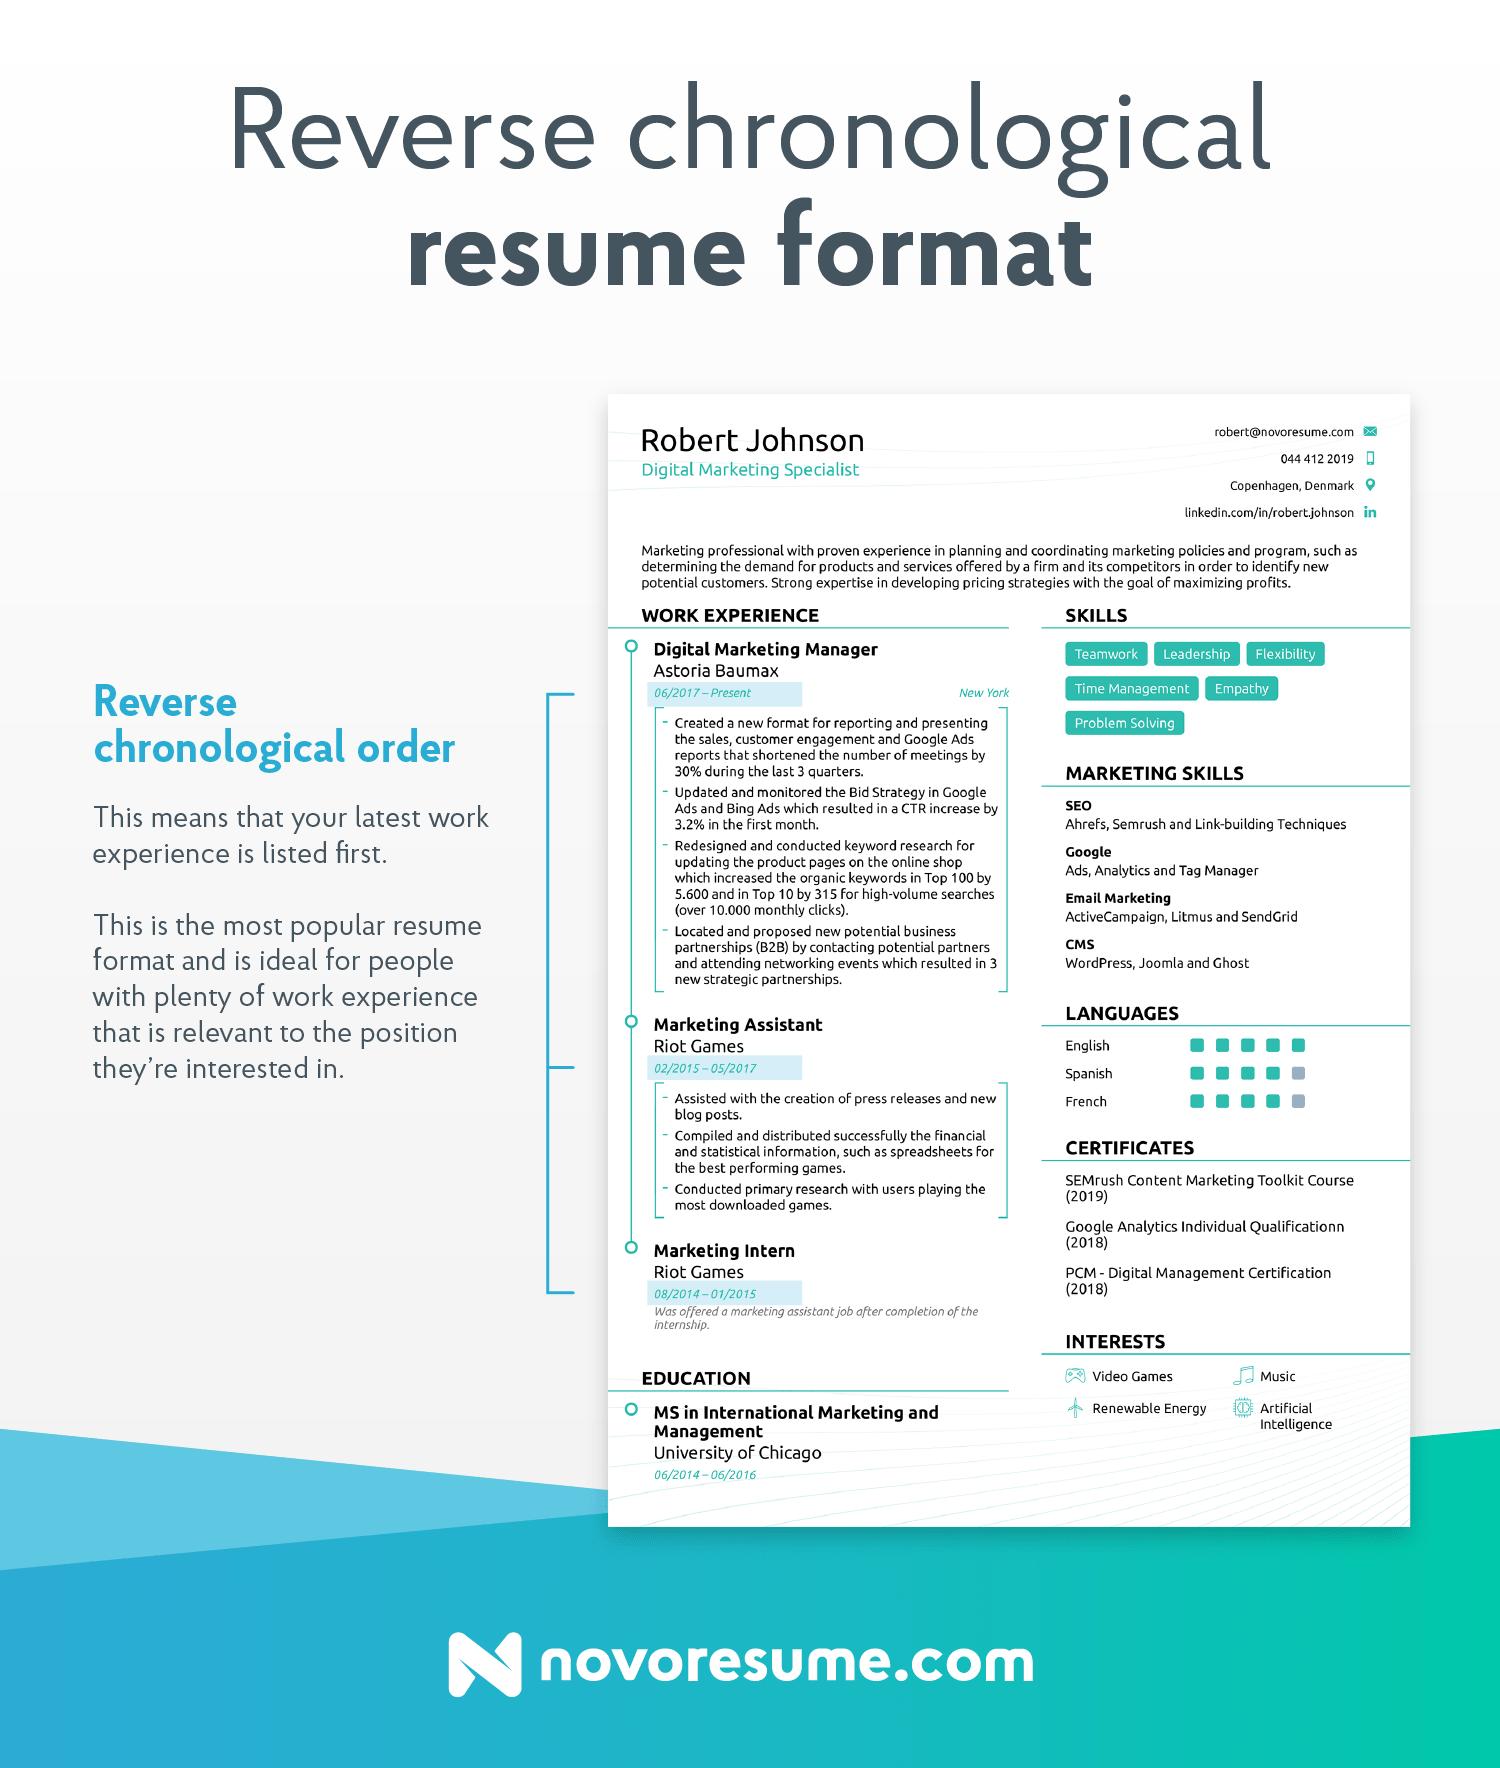 reverse chronological format volunteer